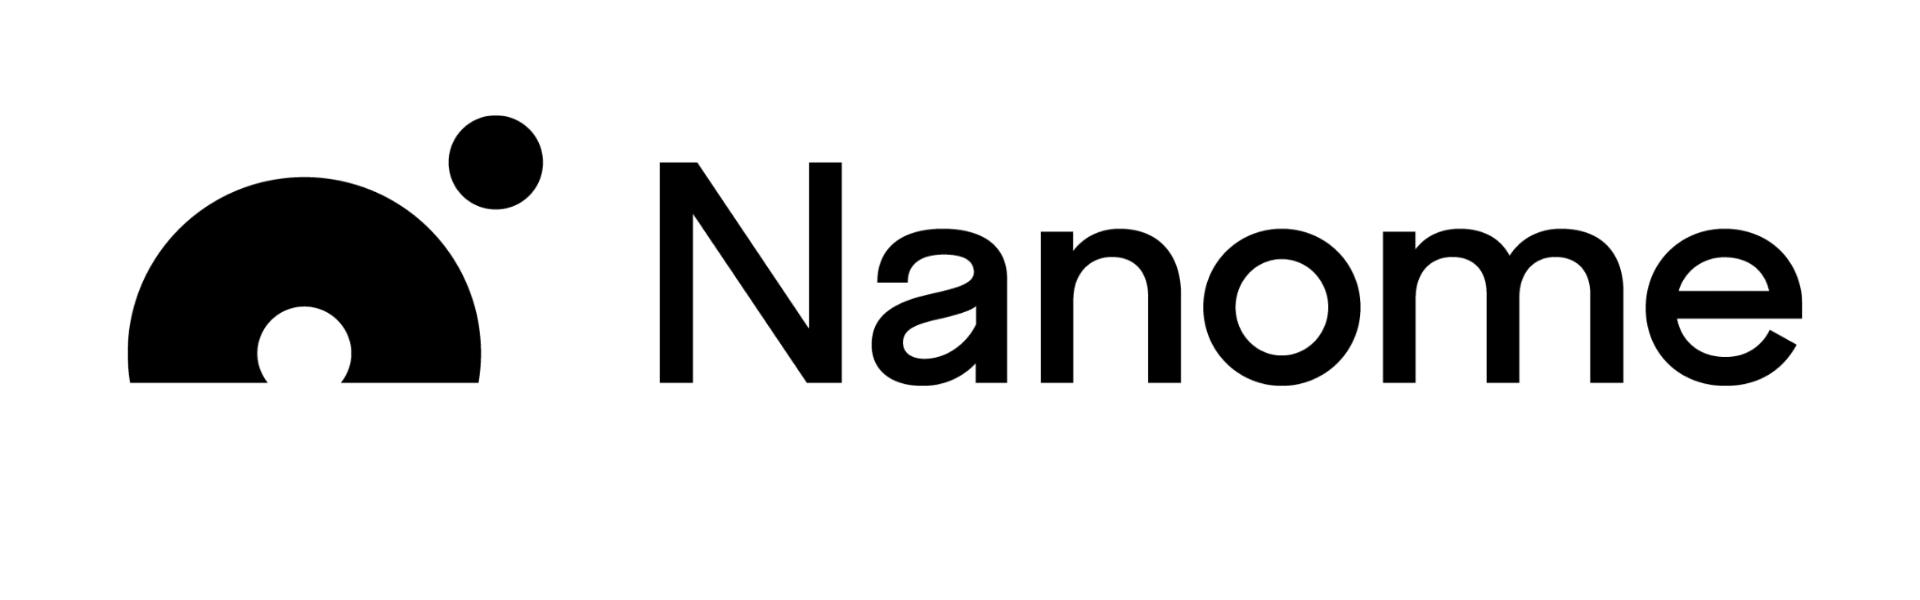 Nanome Logo (1)